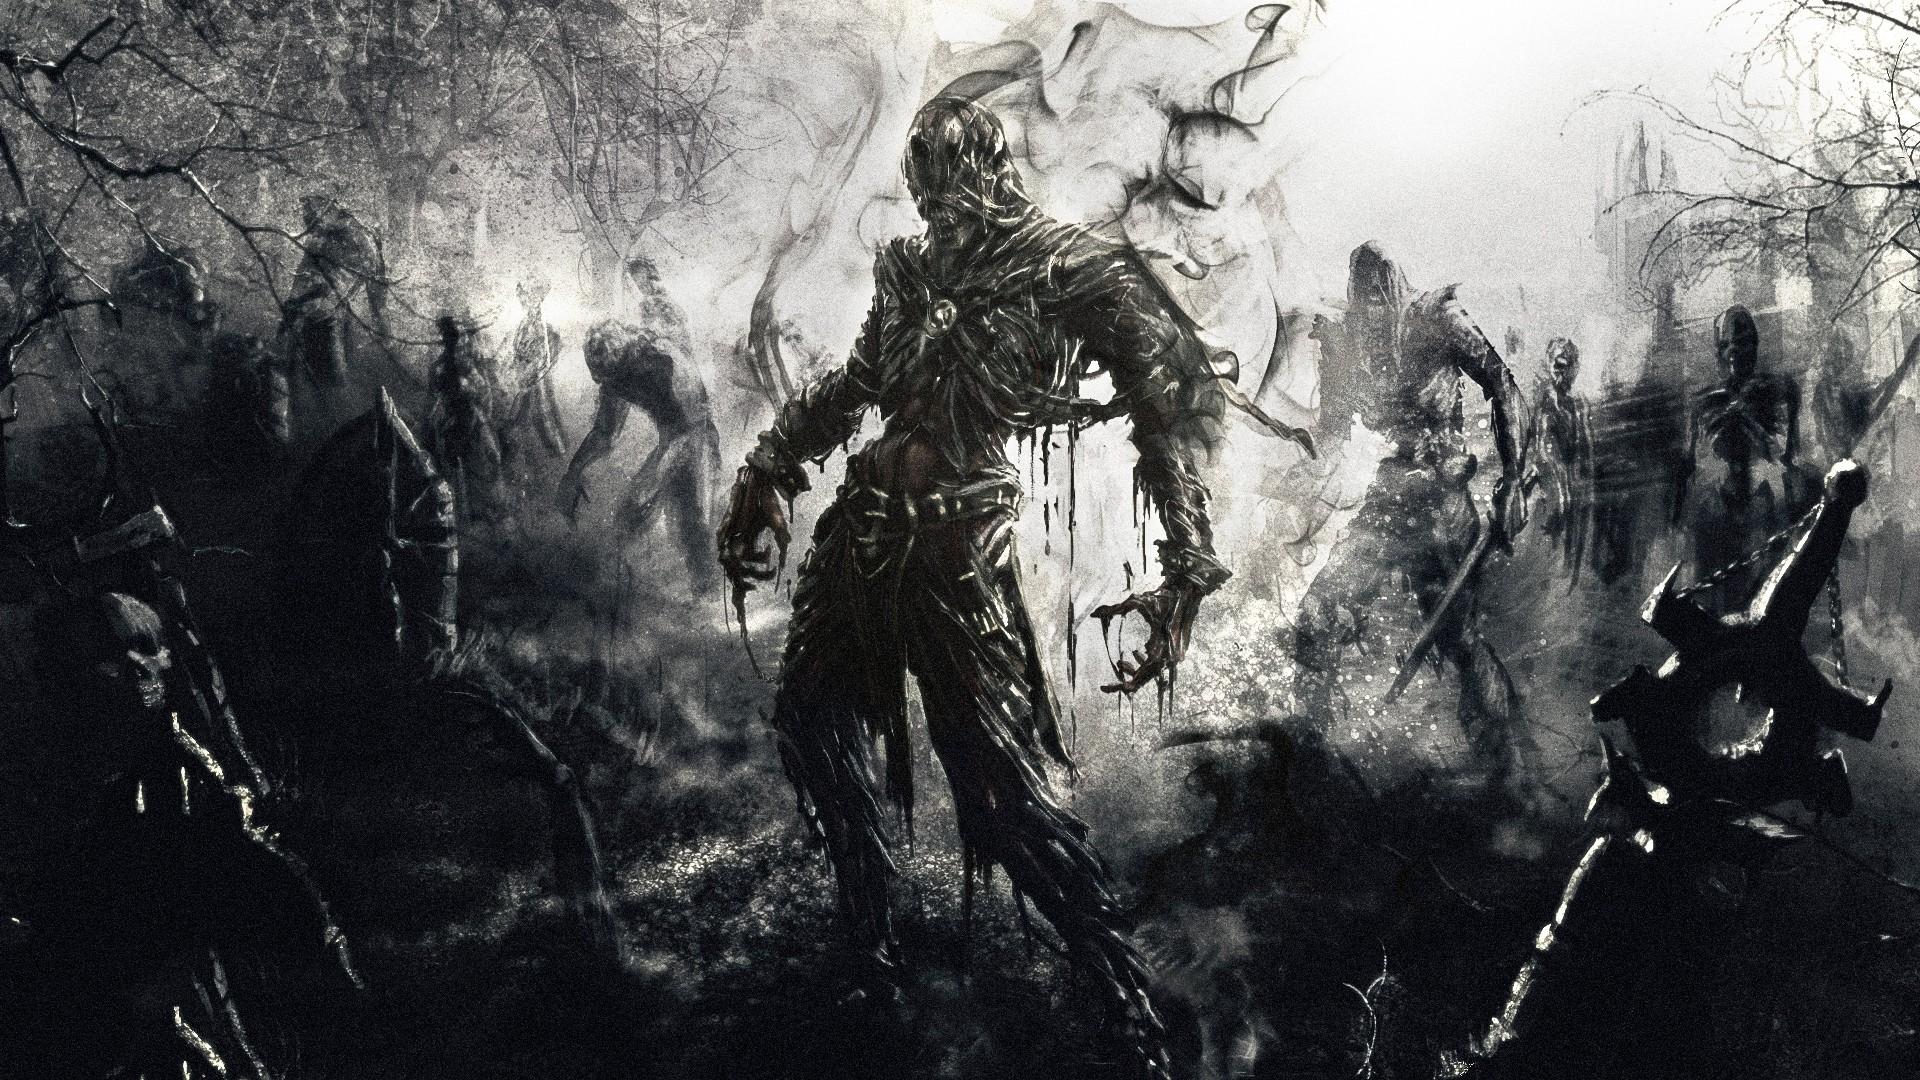 General 1920x1080 fantasy art dark fantasy undead artwork